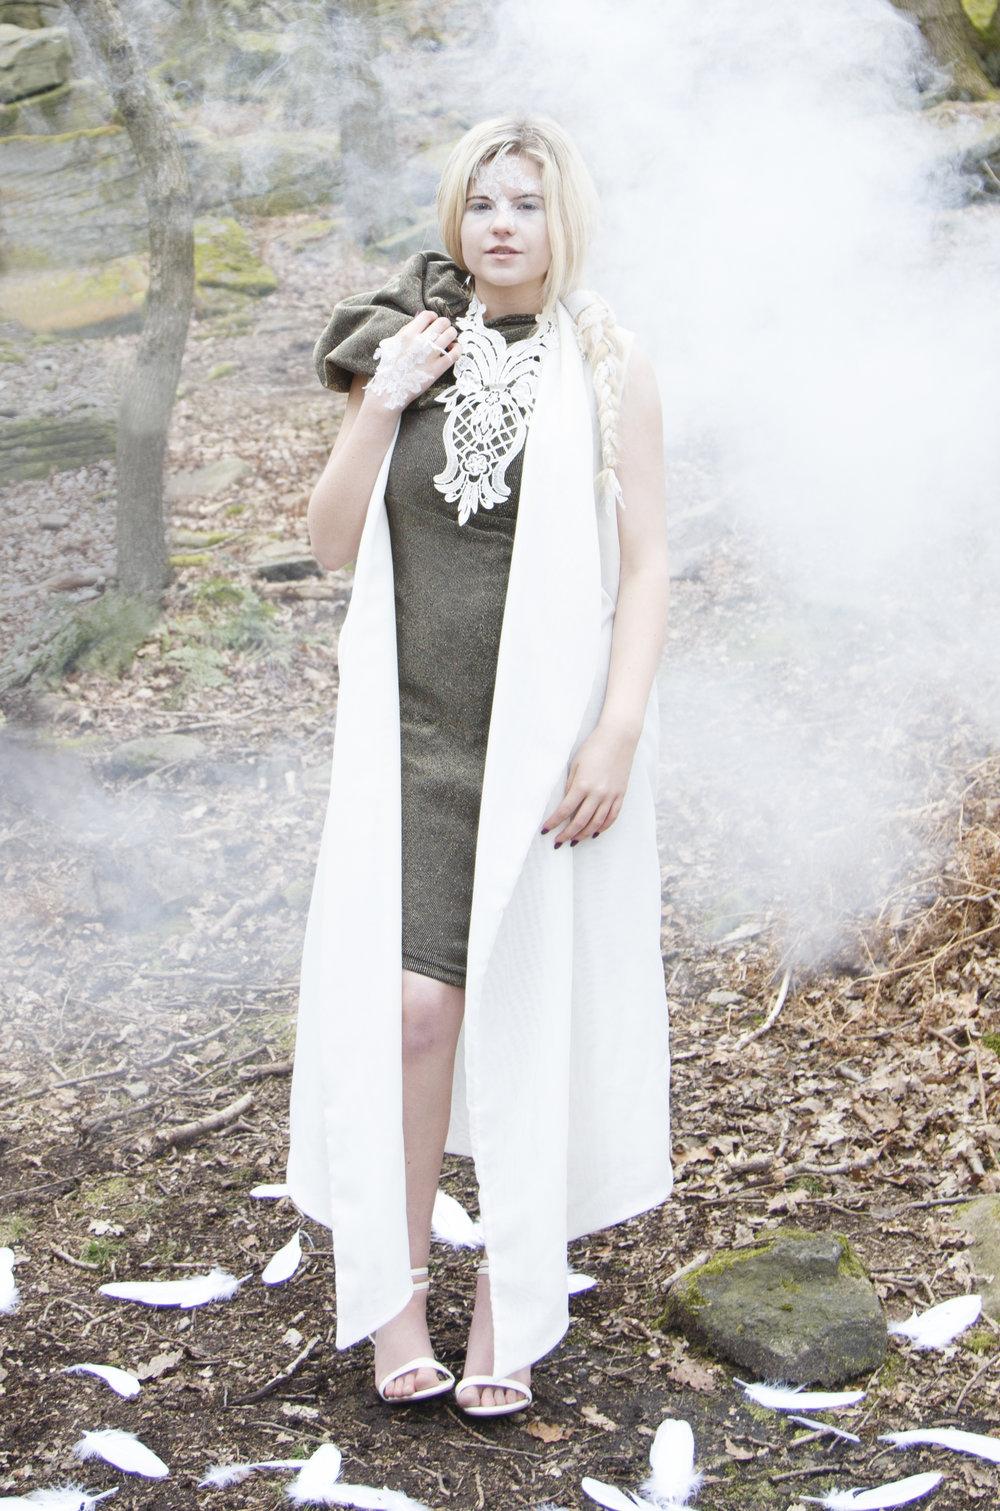 zaramia-ava-zaramiaava-leeds-fashion-designer-ethical-sustainable-smoke-versatile-drape-wrap-gold-cowl-white-dress-styling-location-womenswear-models-photoshoot-location-lace-3